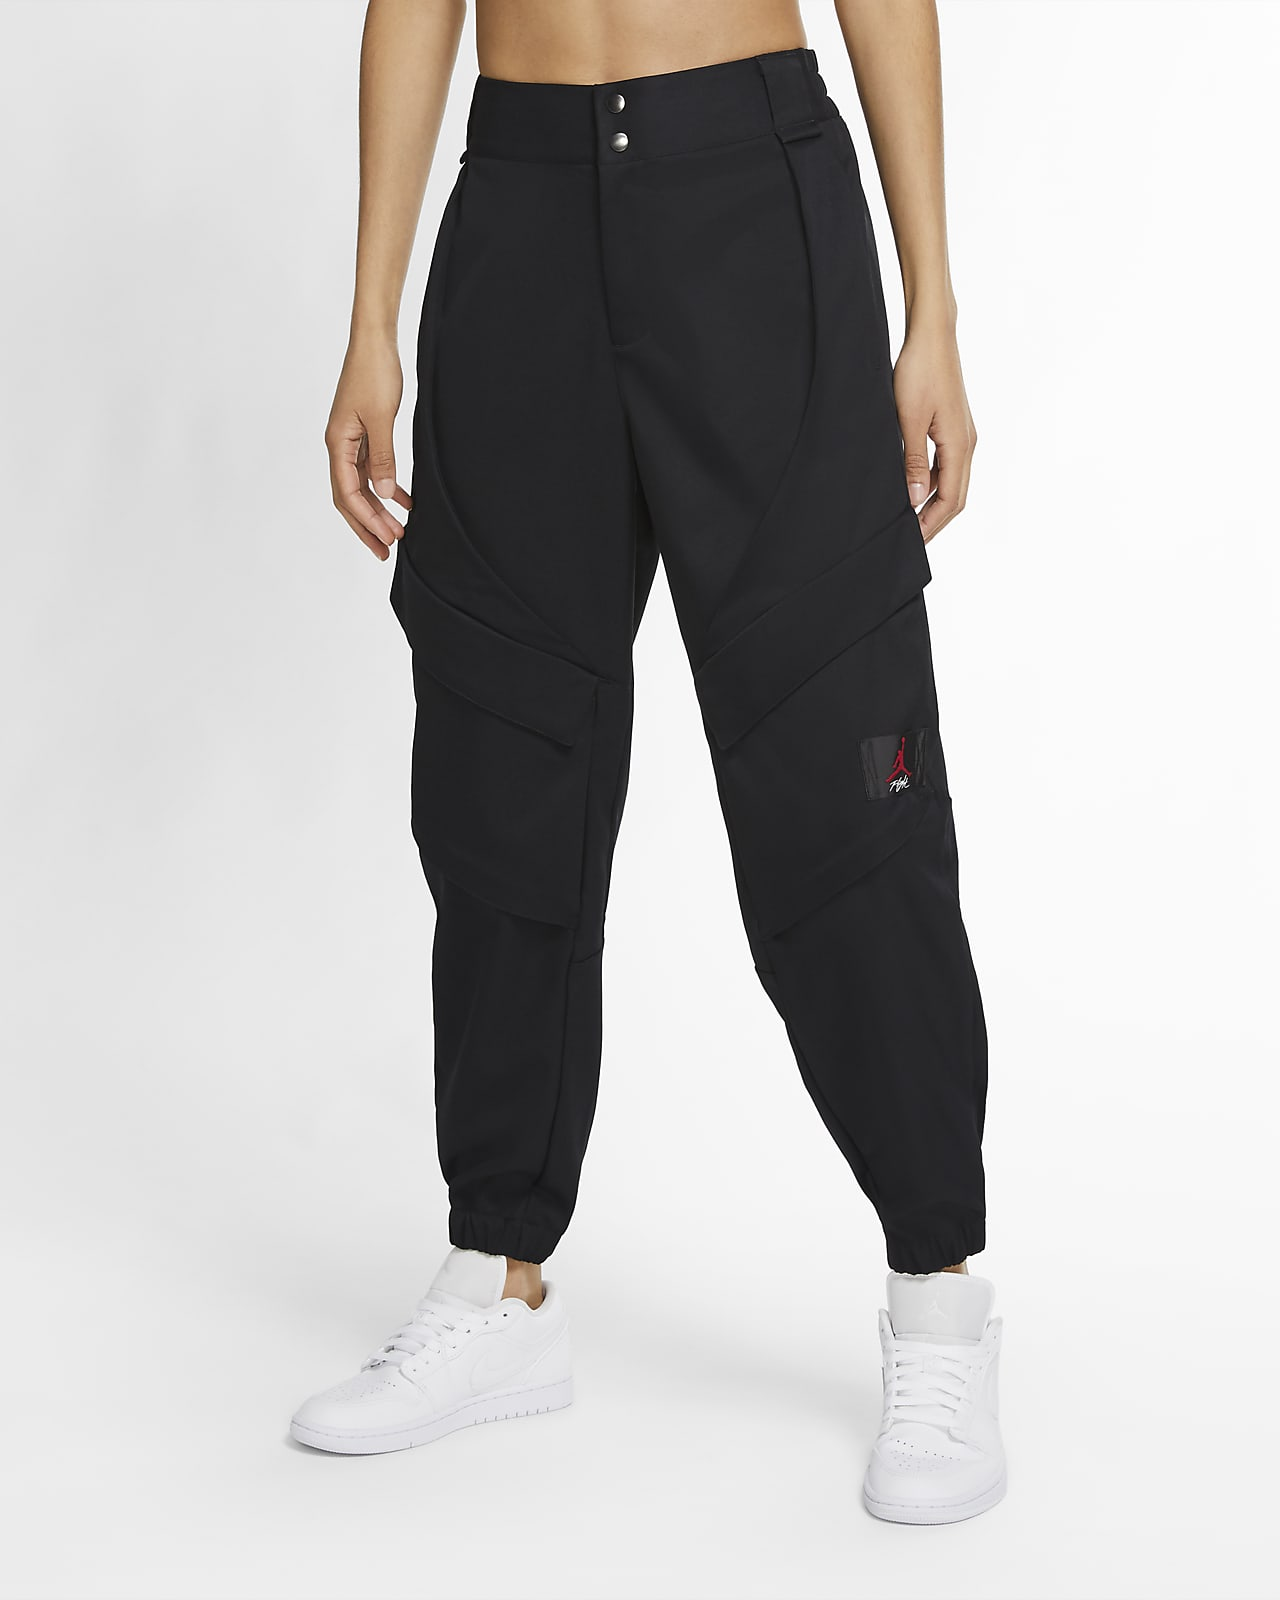 Jordan Essential Women's Utility Trousers